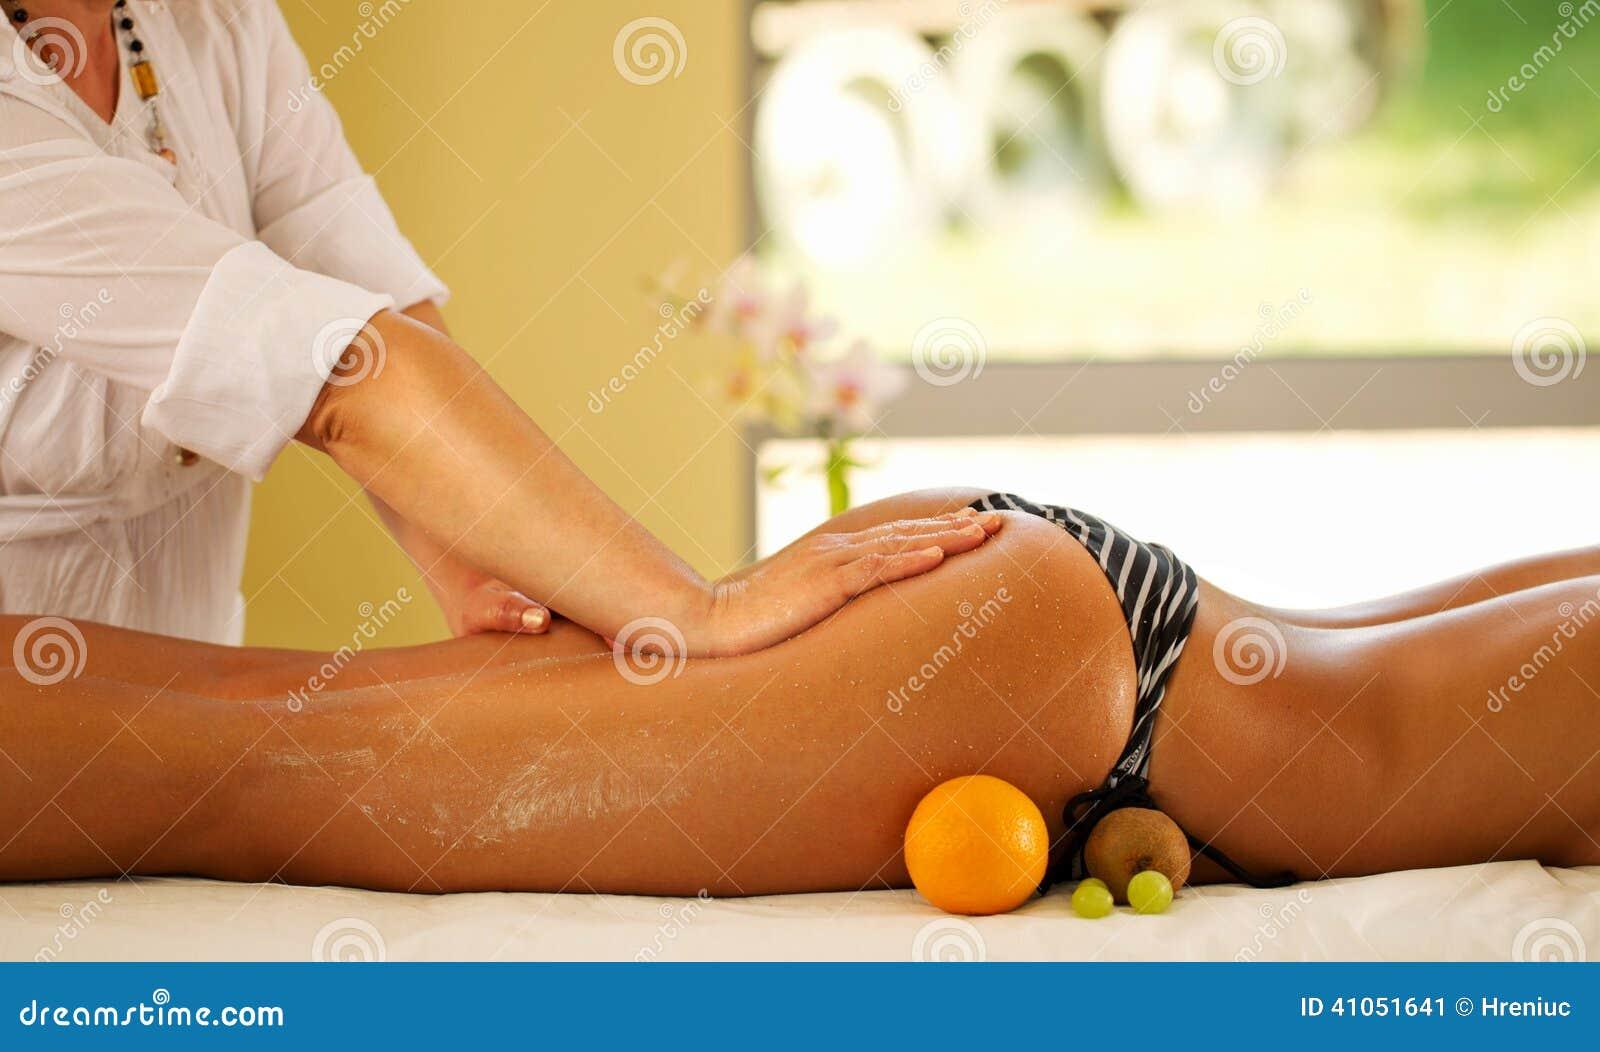 video massage relaxant videos x massages